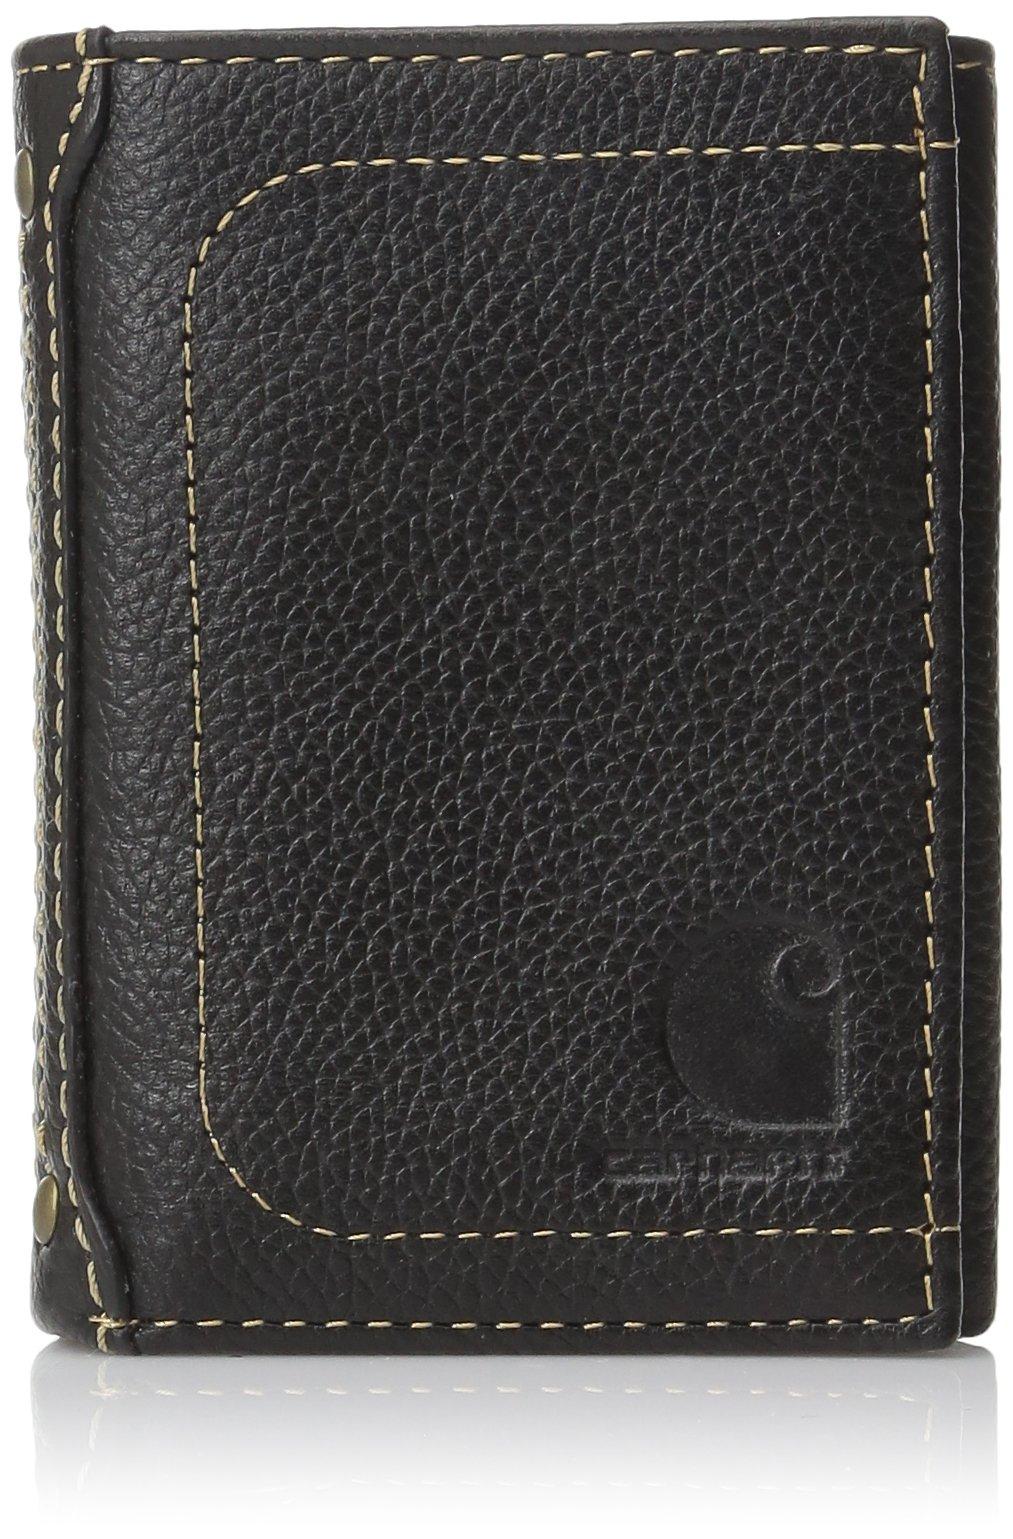 Carhartt Men's Trifold Wallet,Black,One Size